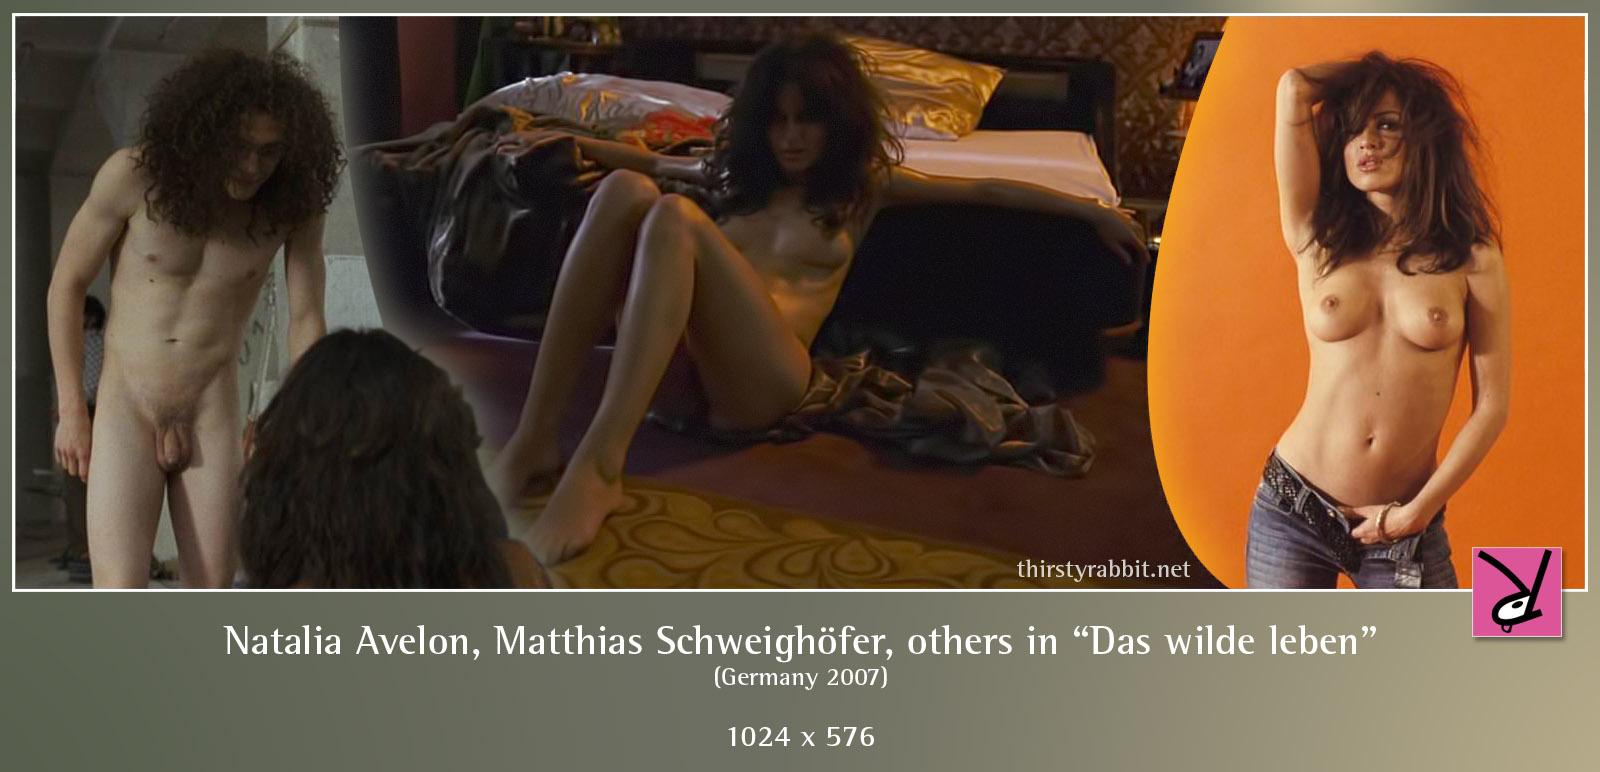 Nackt susanne langhans Biografie Susanne